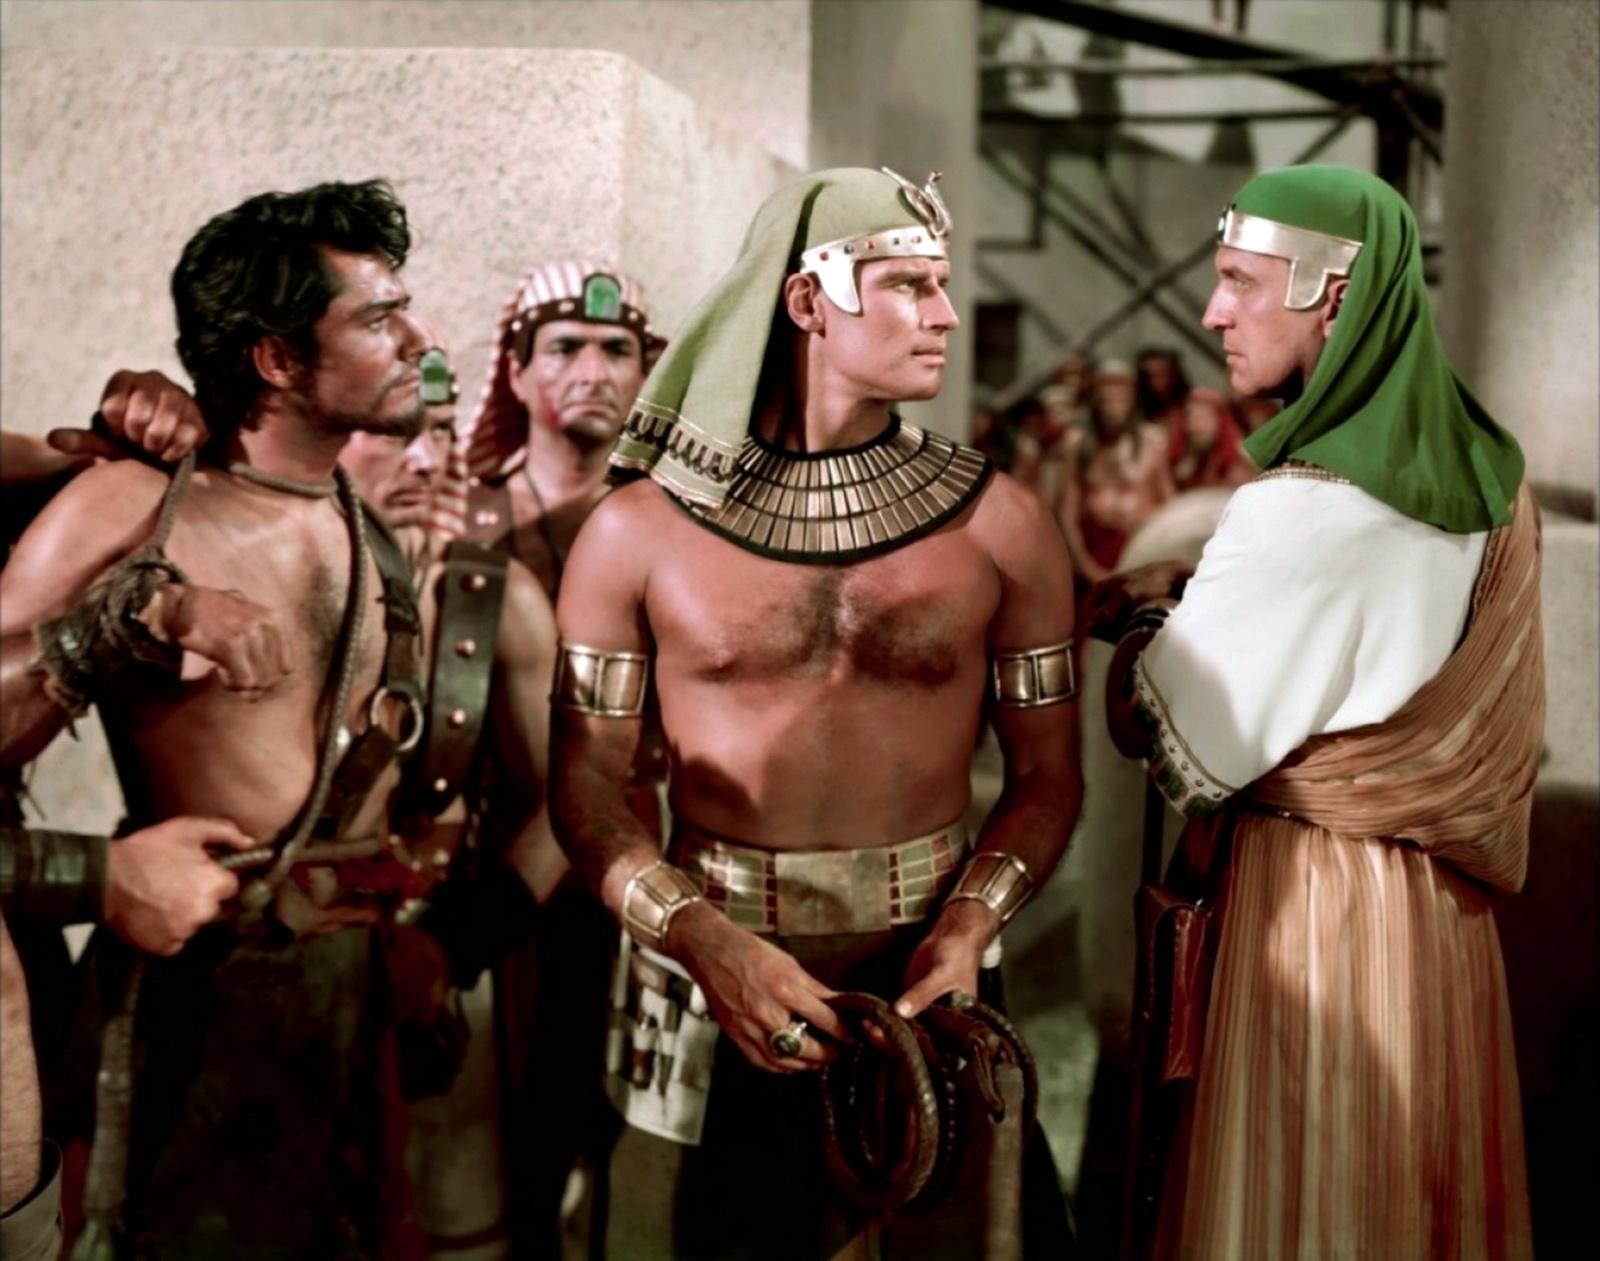 Charlton Heston in The Ten Commandments with (L to R) John Derek, Charlton Heston, Vincent Price